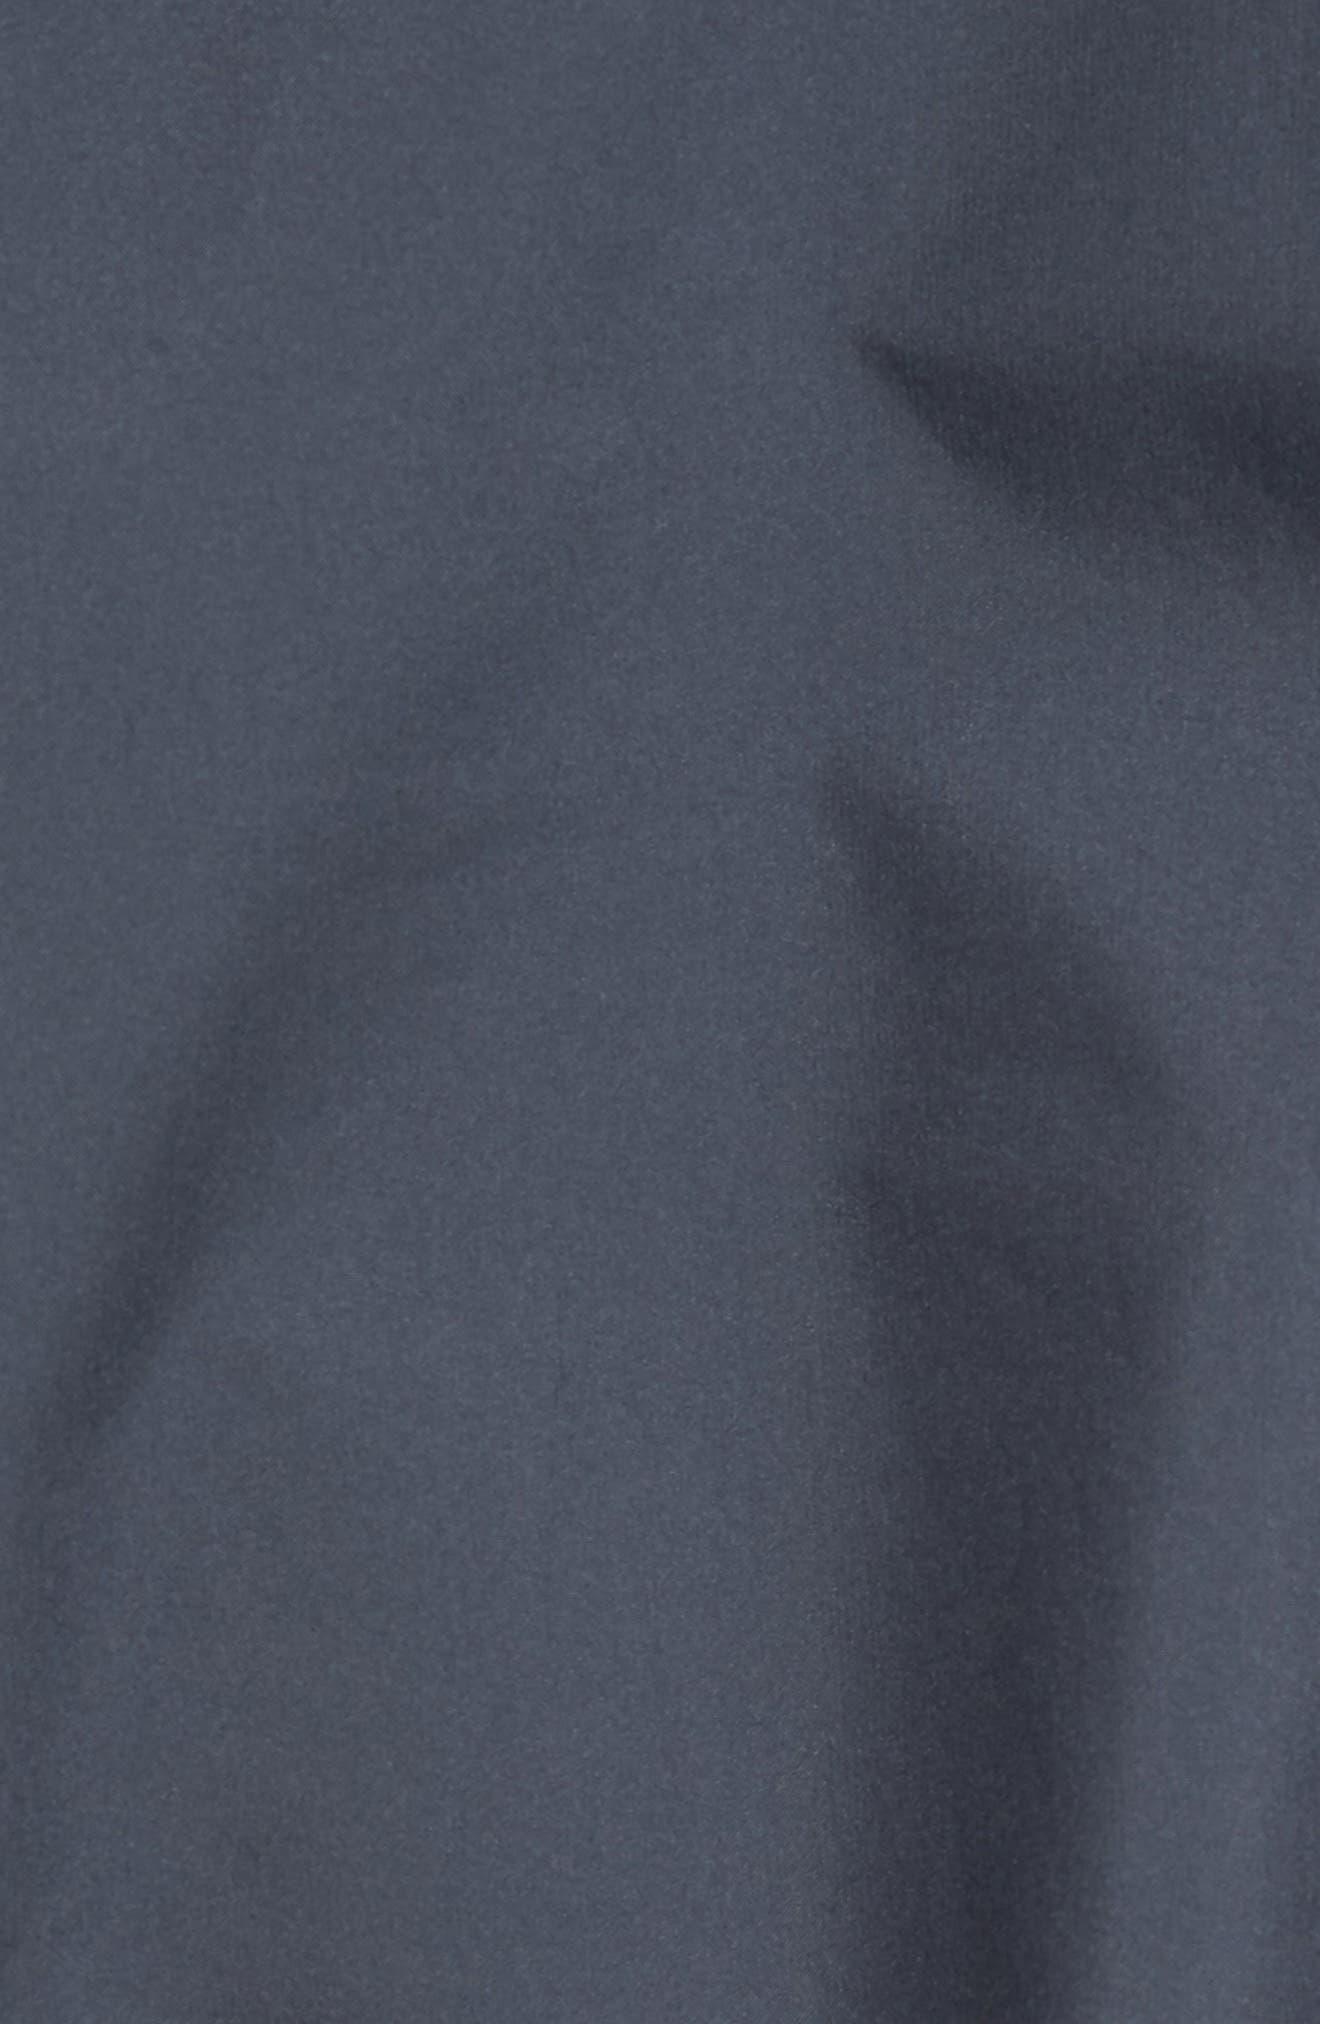 Regular Fit Jacket,                             Alternate thumbnail 5, color,                             Slate